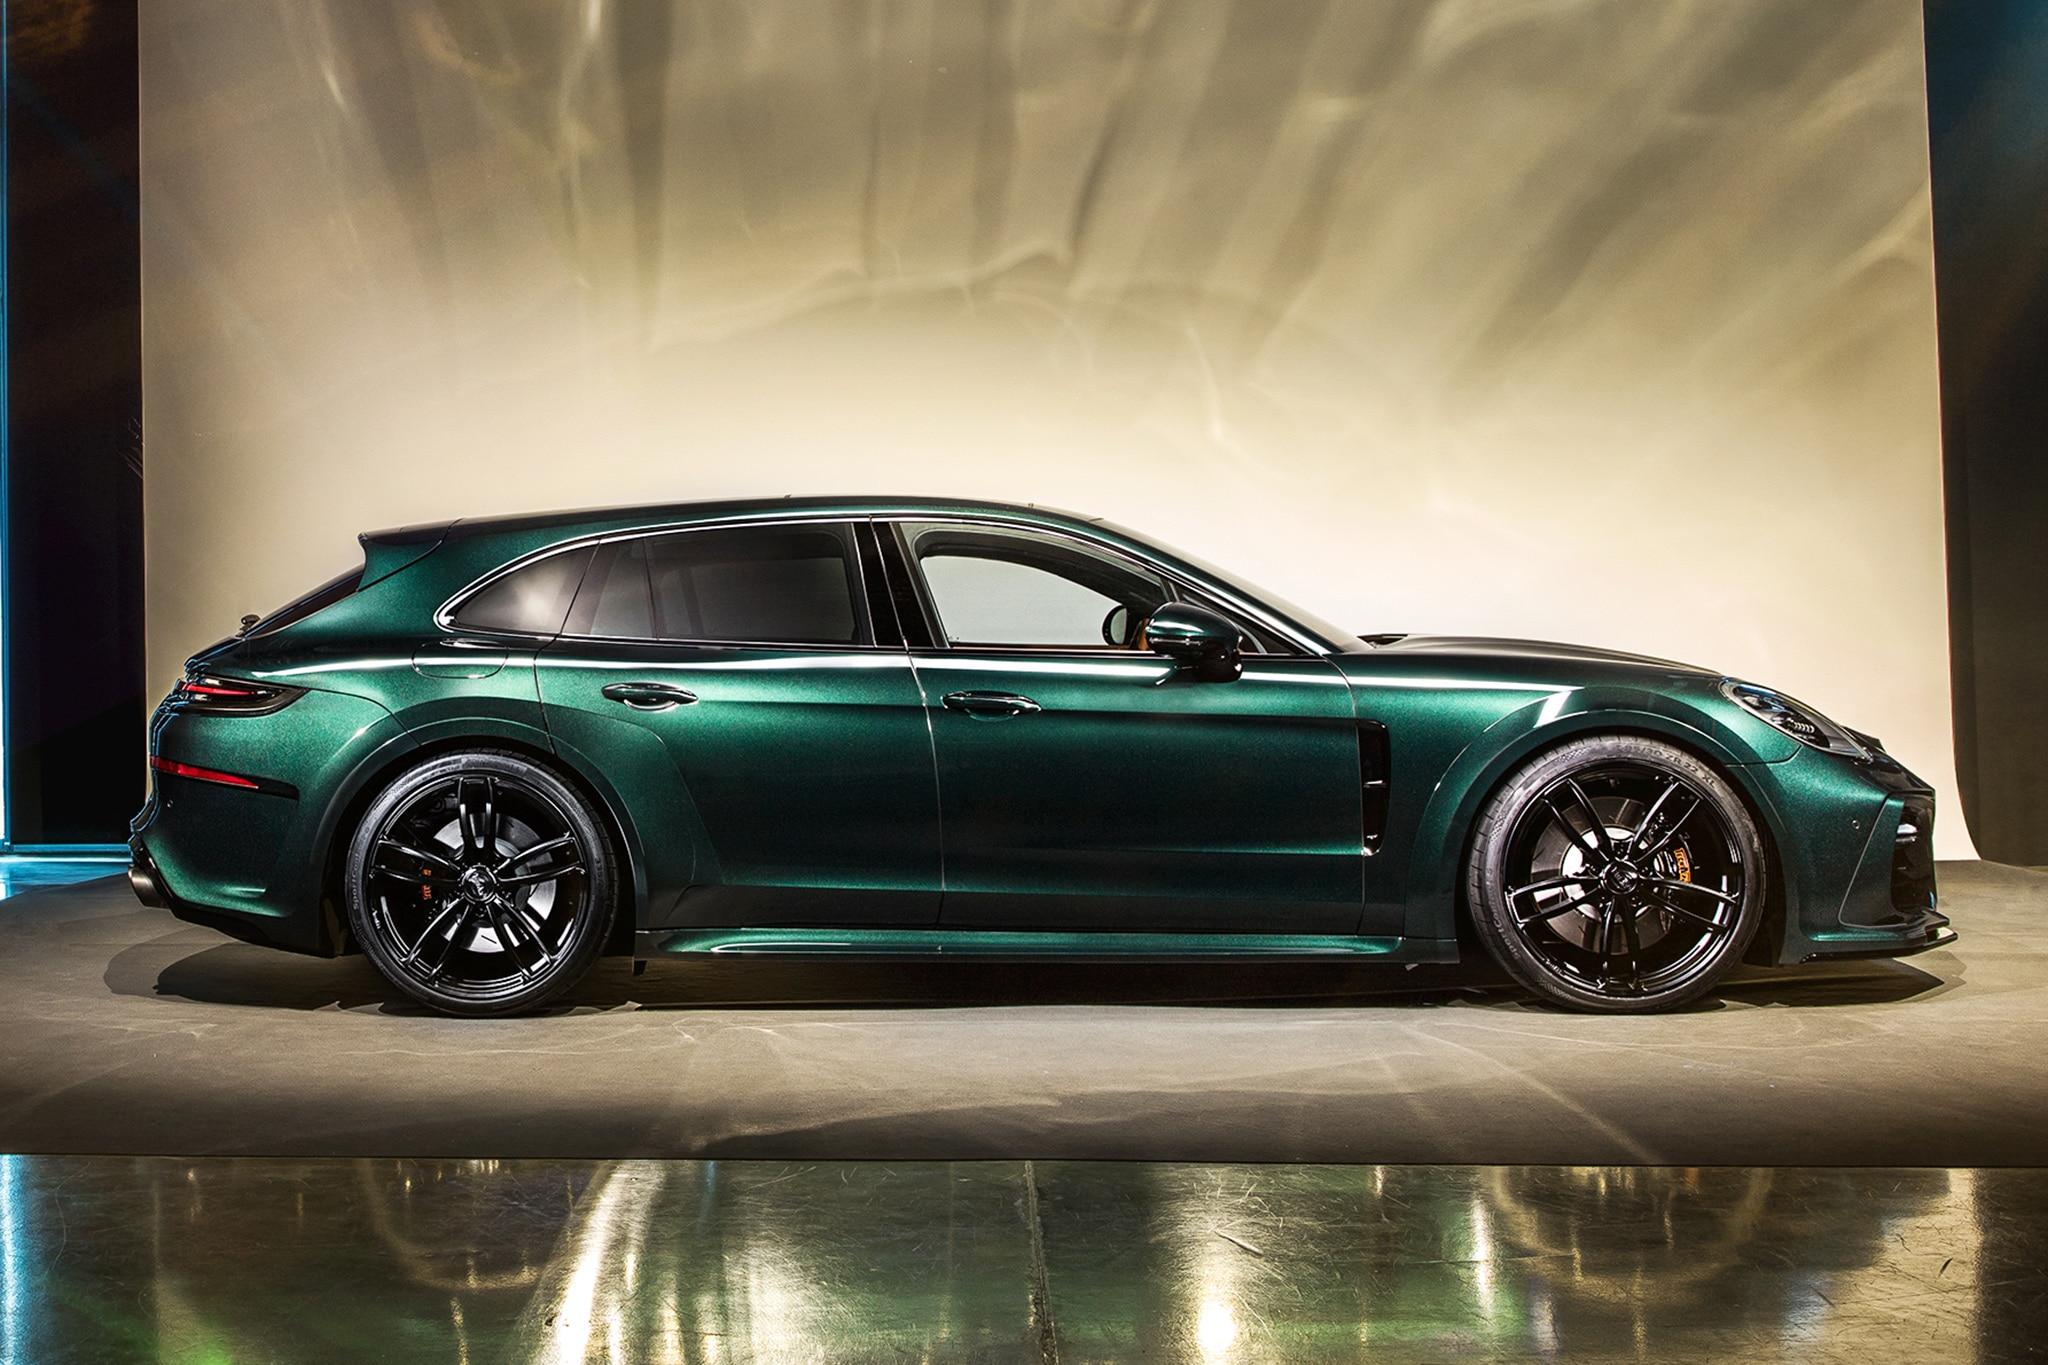 Techart\u0027s Porsche Panamera Sport Turismo Package to Debut in